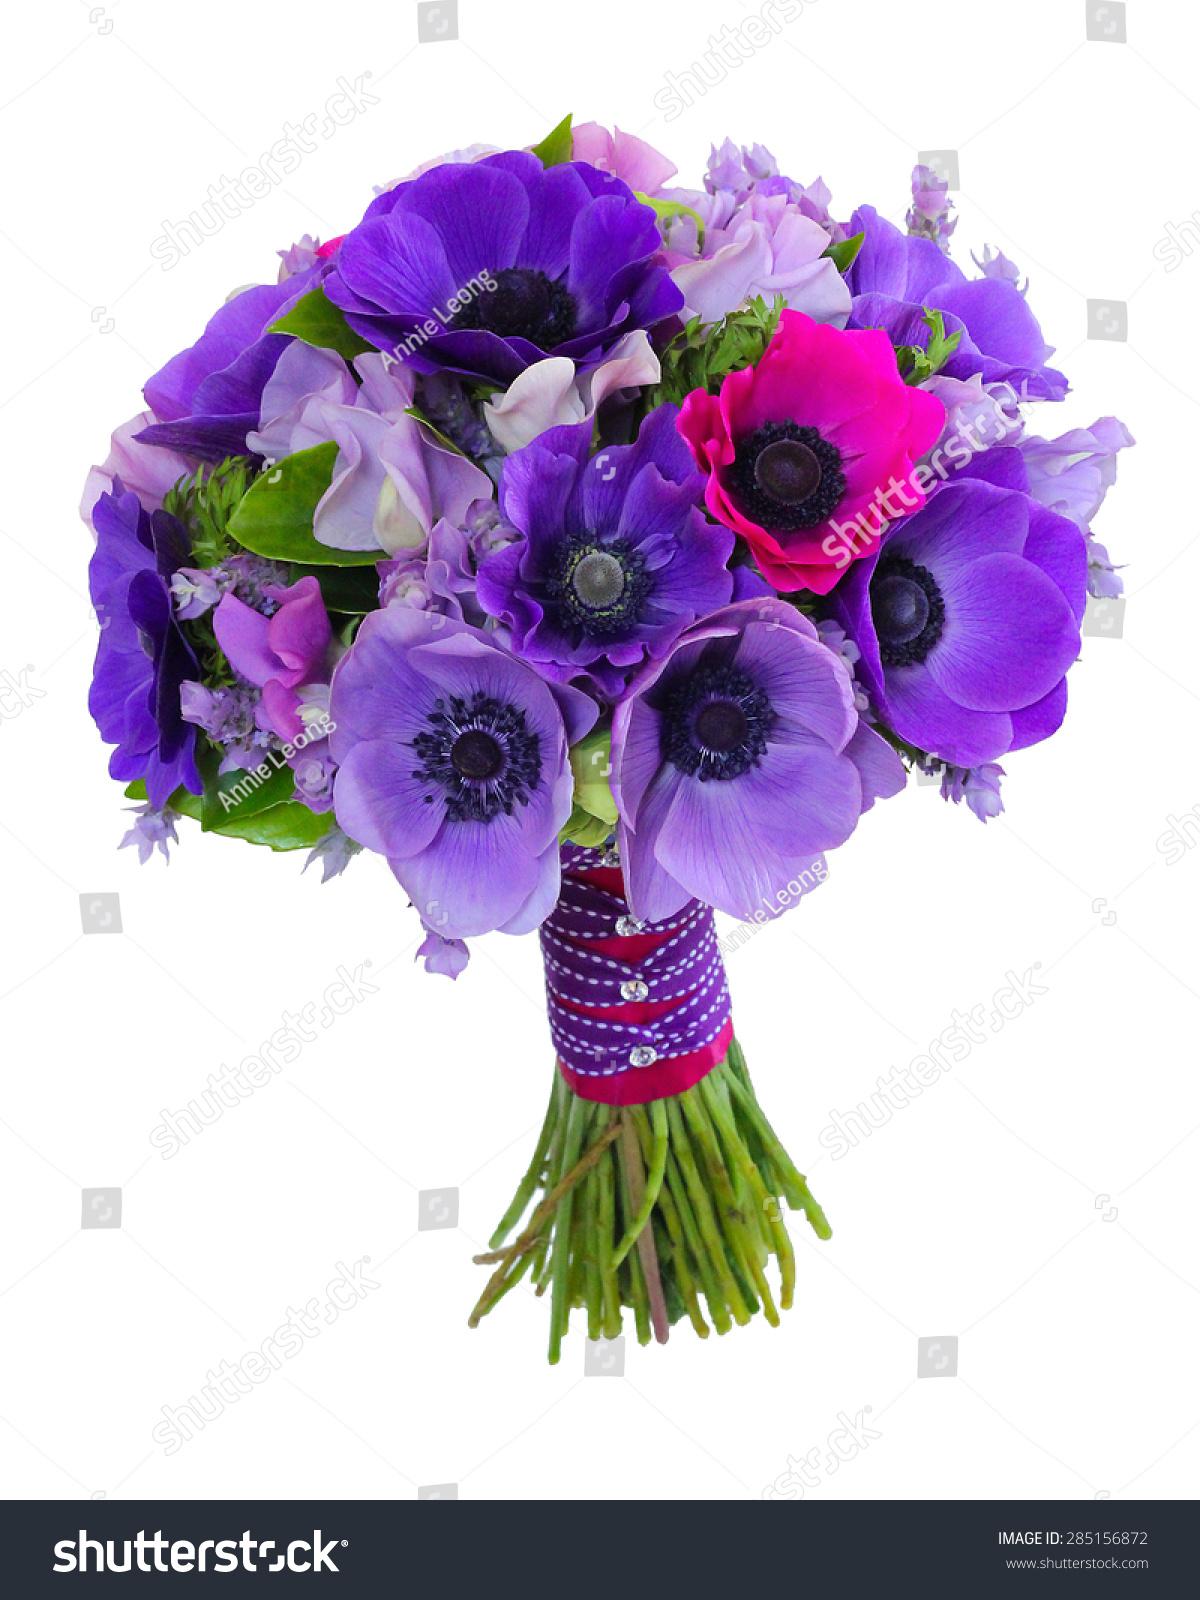 Purple anemone sweet pea wedding bouquet stock photo edit now purple anemone and sweet pea wedding bouquet isolated on white background izmirmasajfo